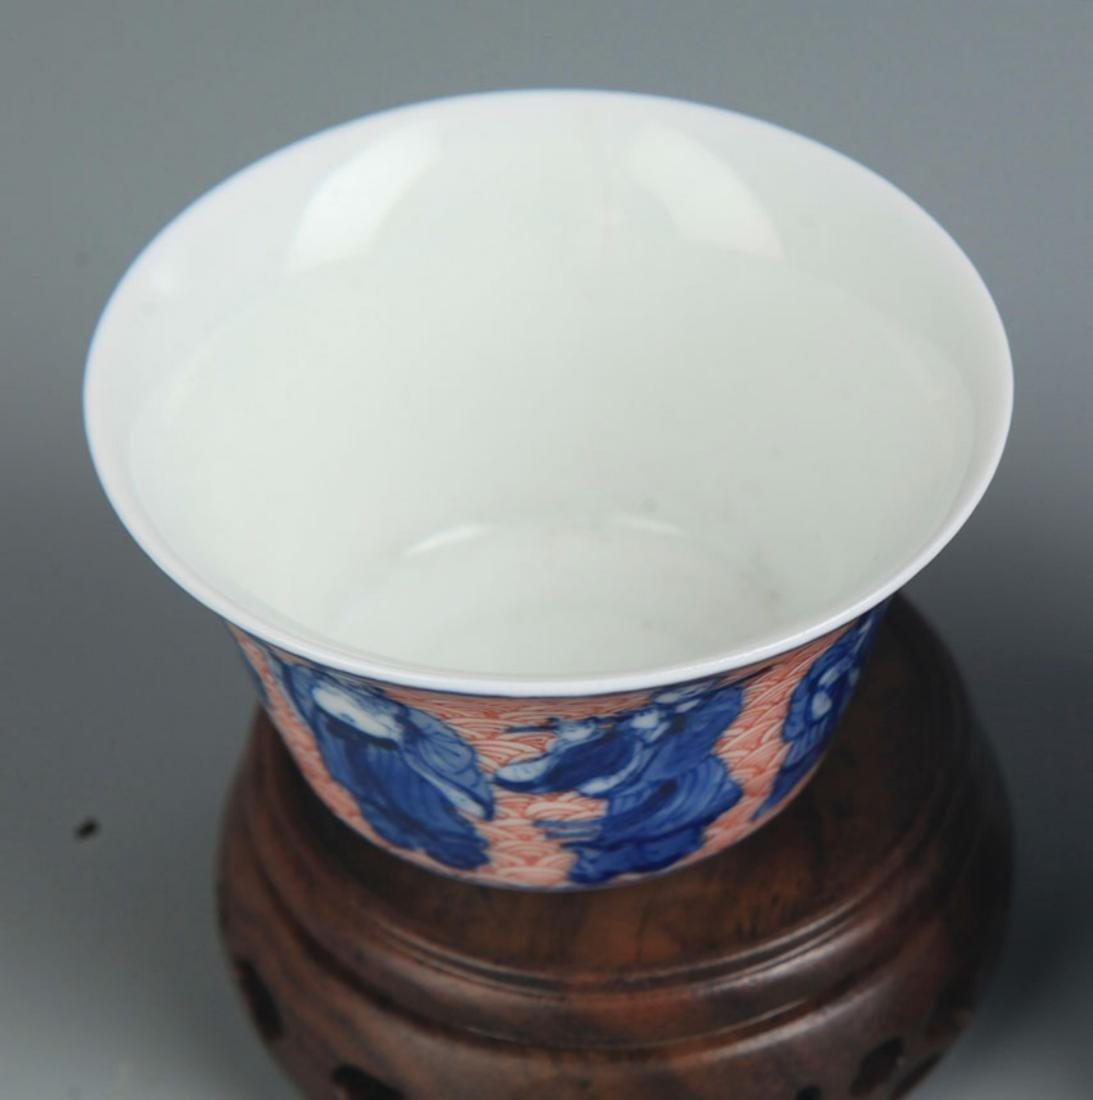 PARI OF ROUGE COLOR PAIR OF PORCELAIN CUP - 2